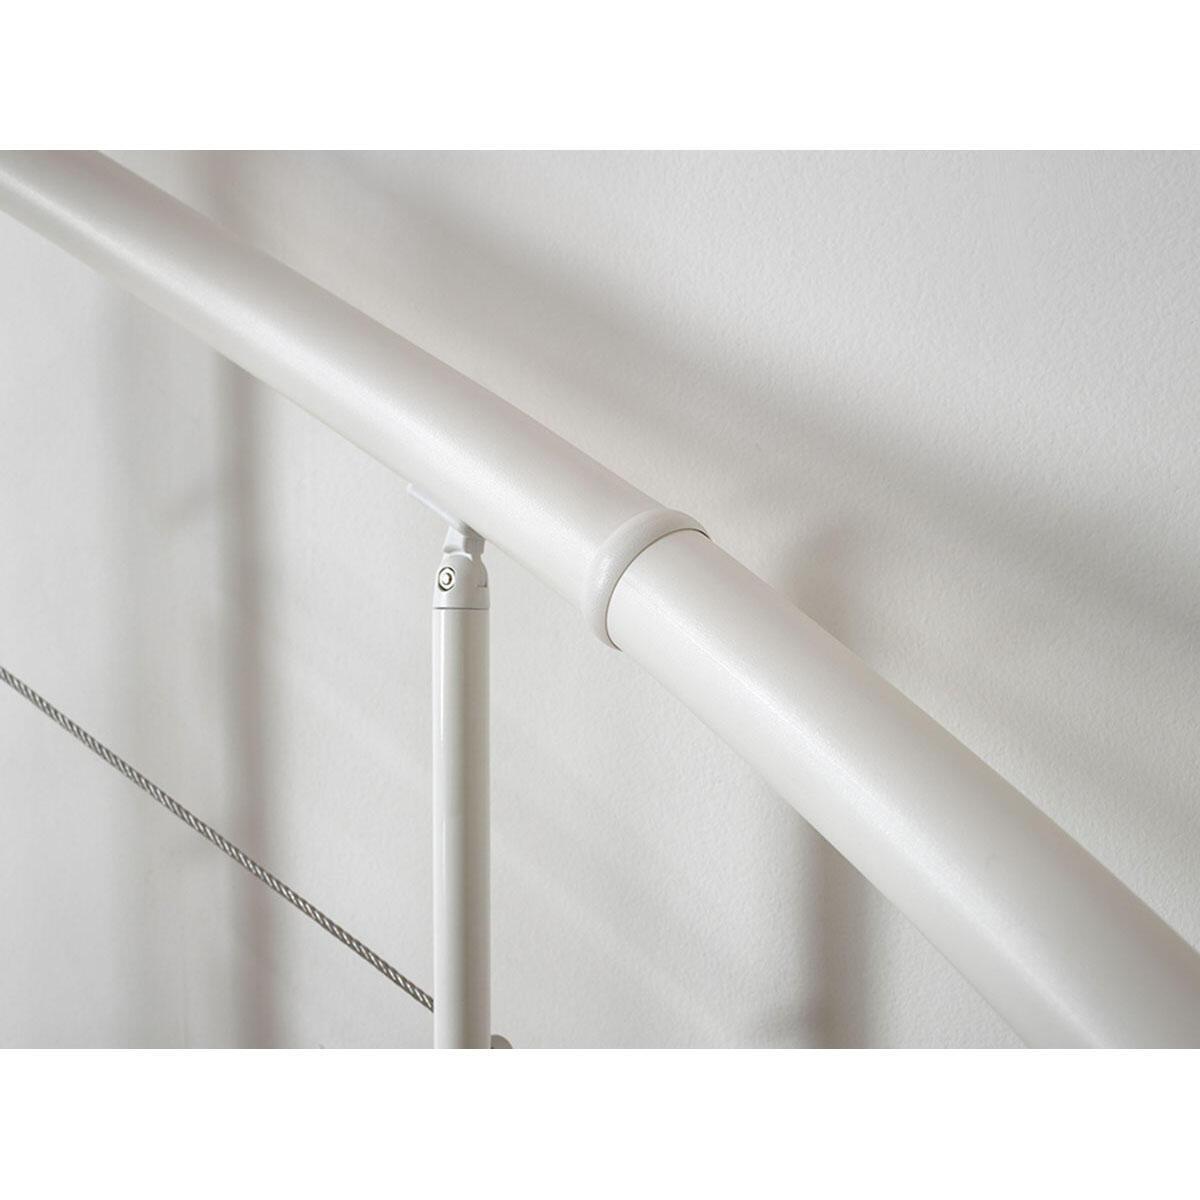 Scala a chiocciola tonda Symphonie FONTANOT L 120 cm, gradino noce, struttura bianco - 9